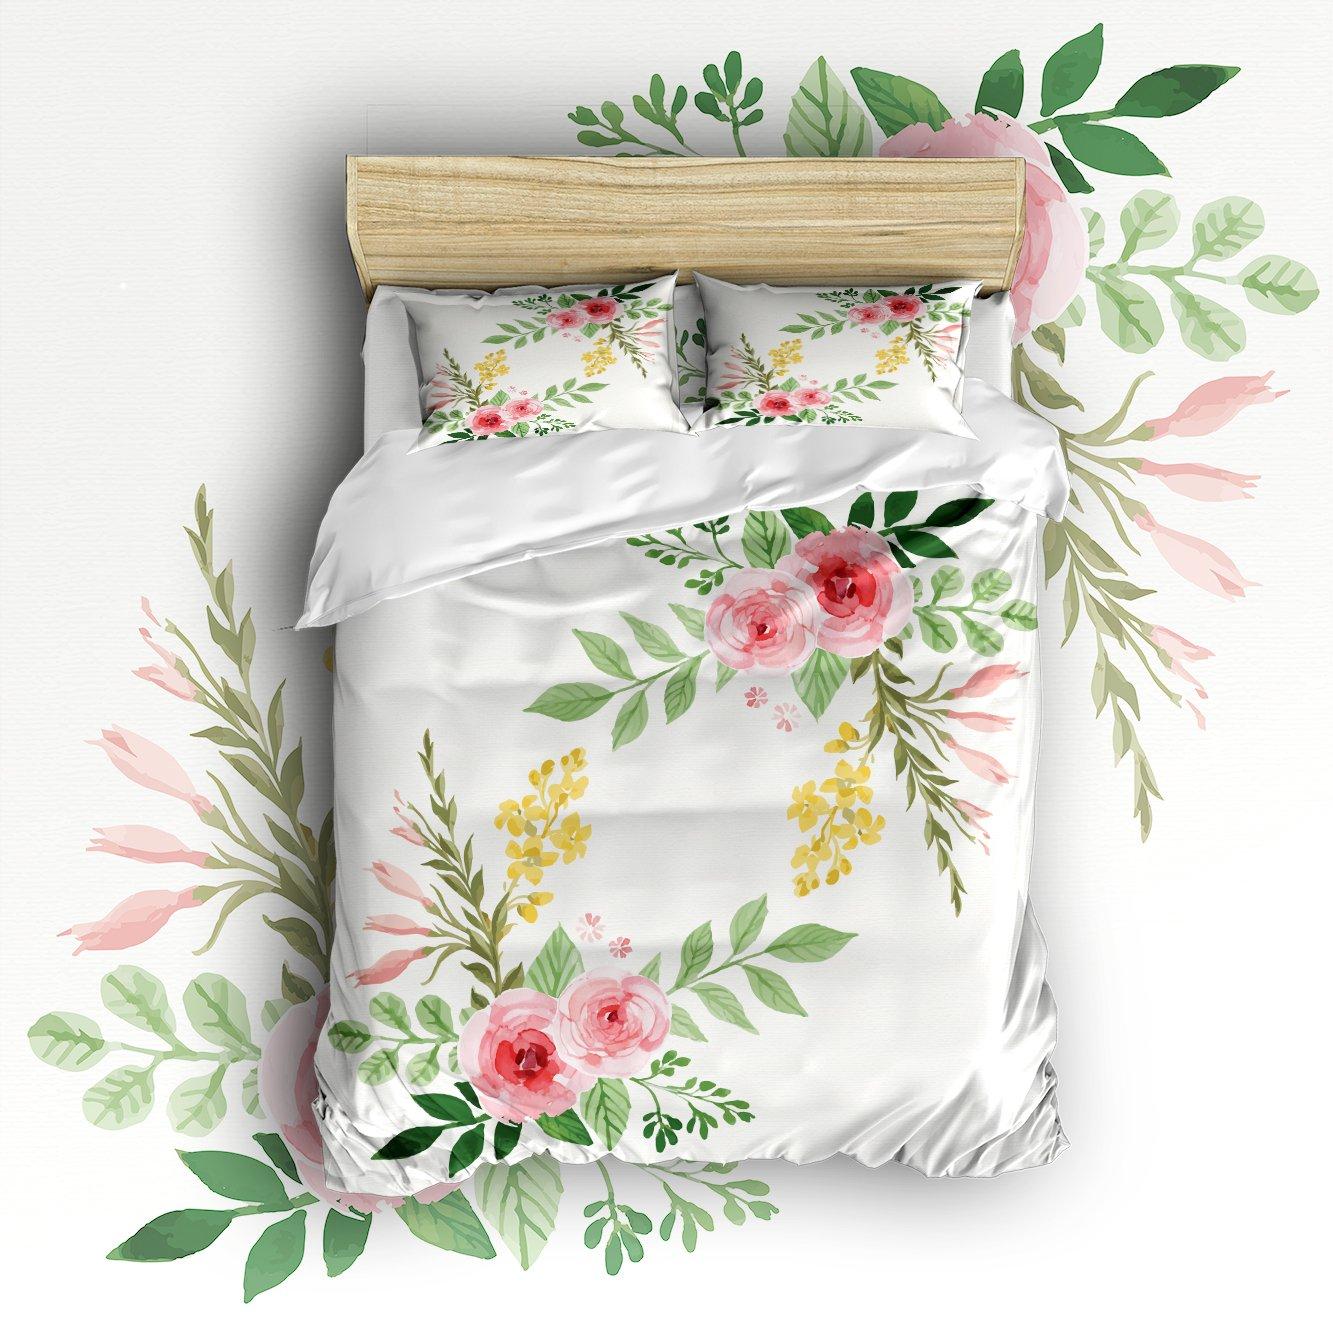 Beauty Decor Bedding 4 Piece bed Set Duvet Cover,flowers 4 Piece Bed Sheet Set 1 Flat Sheet 1 Fitted Sheet and 7 Pillow Cases